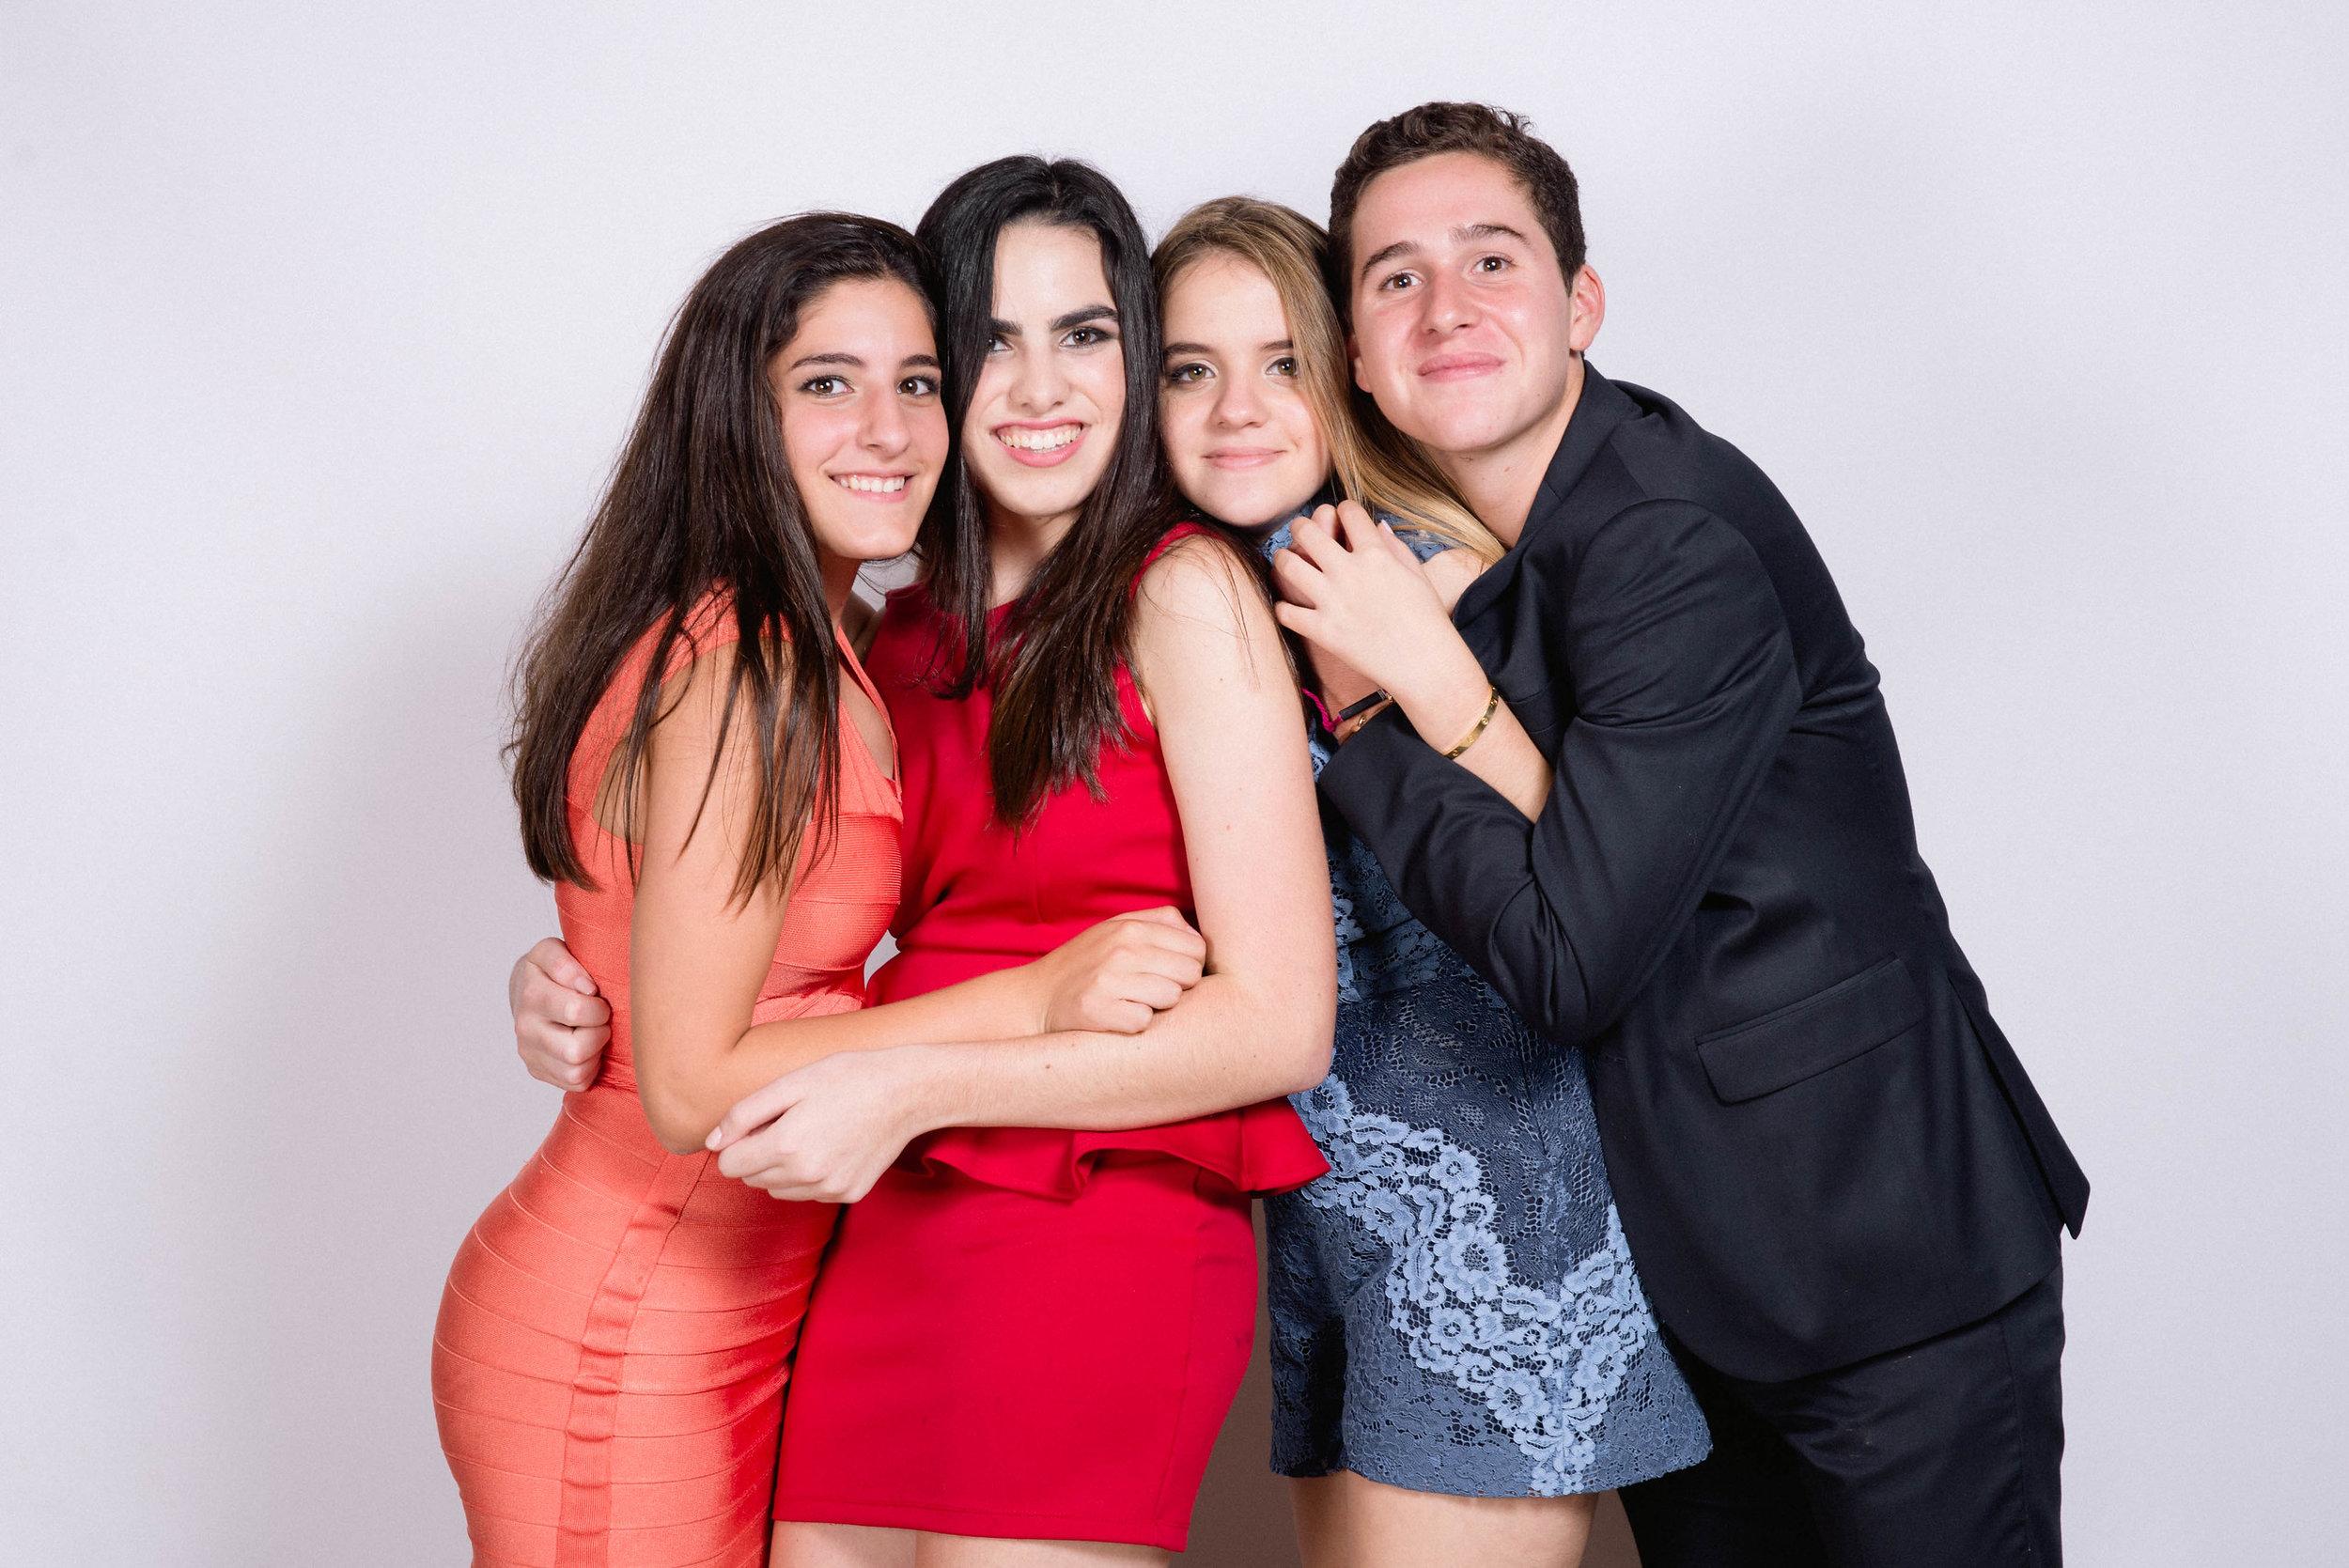 cabina_fotos_photobooth001.jpg